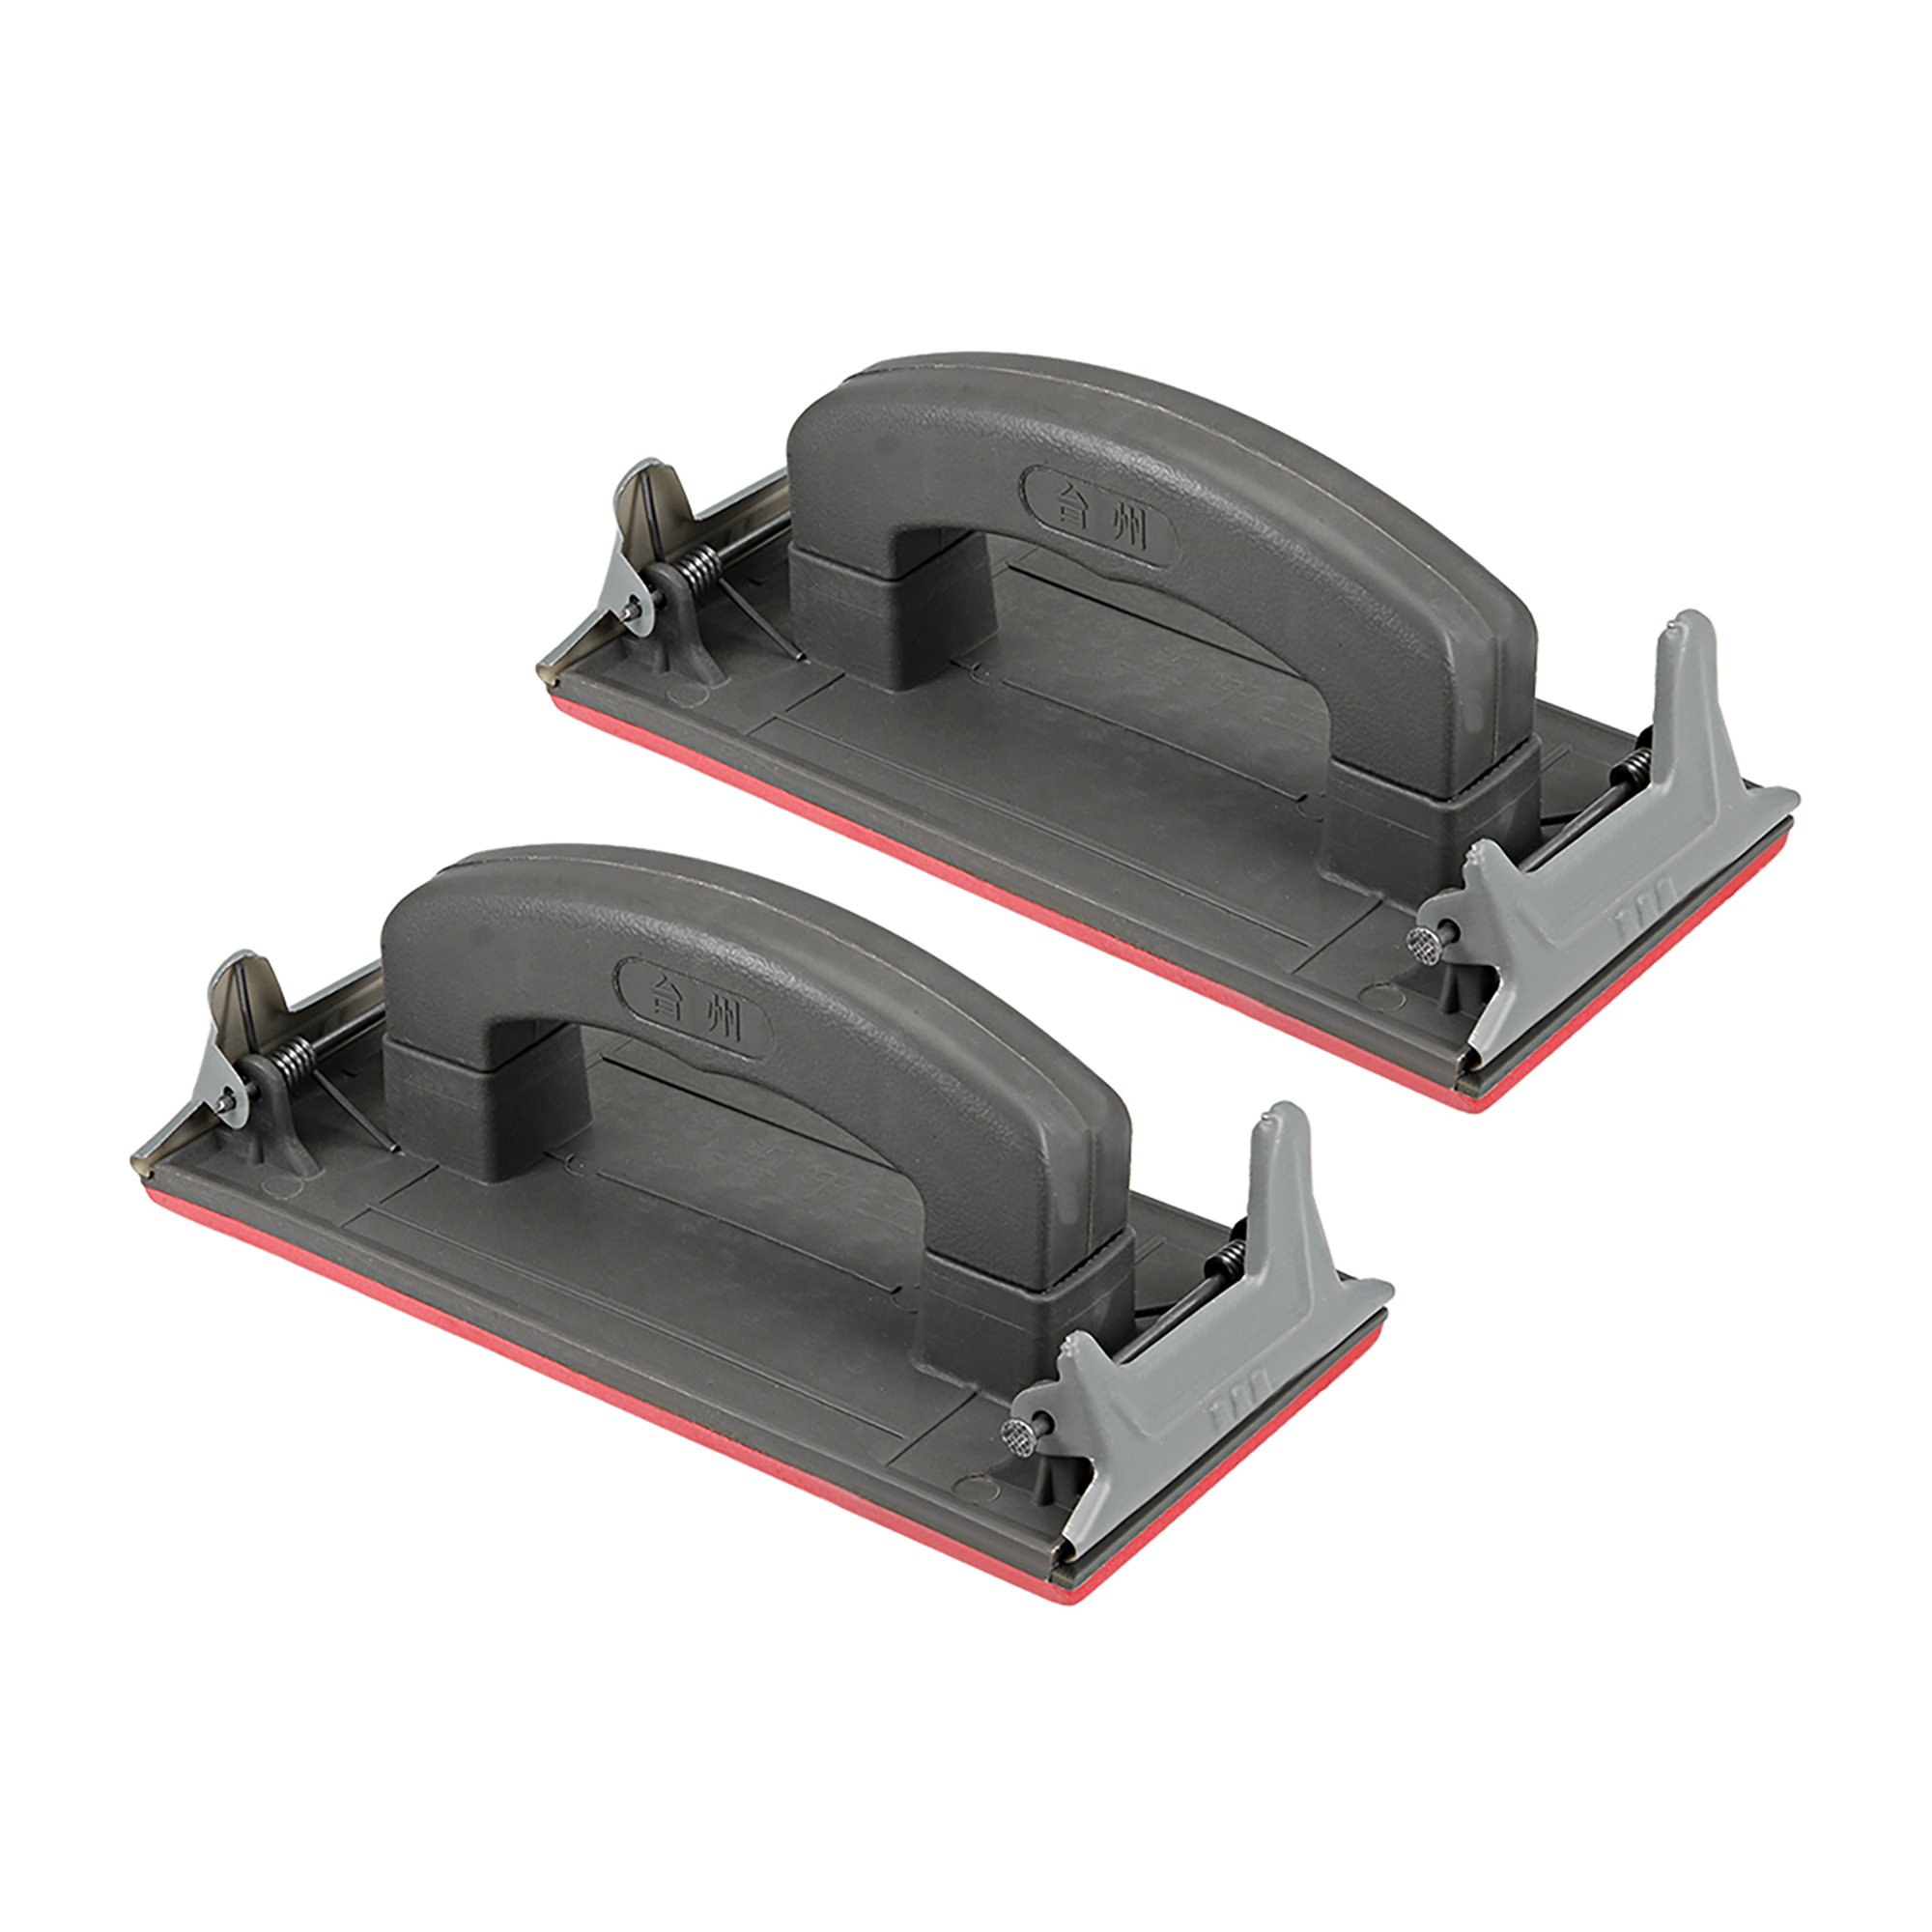 metal polishing 2 pieces drywall manual sanding stand for manual sanding block for wood manual sander with handle